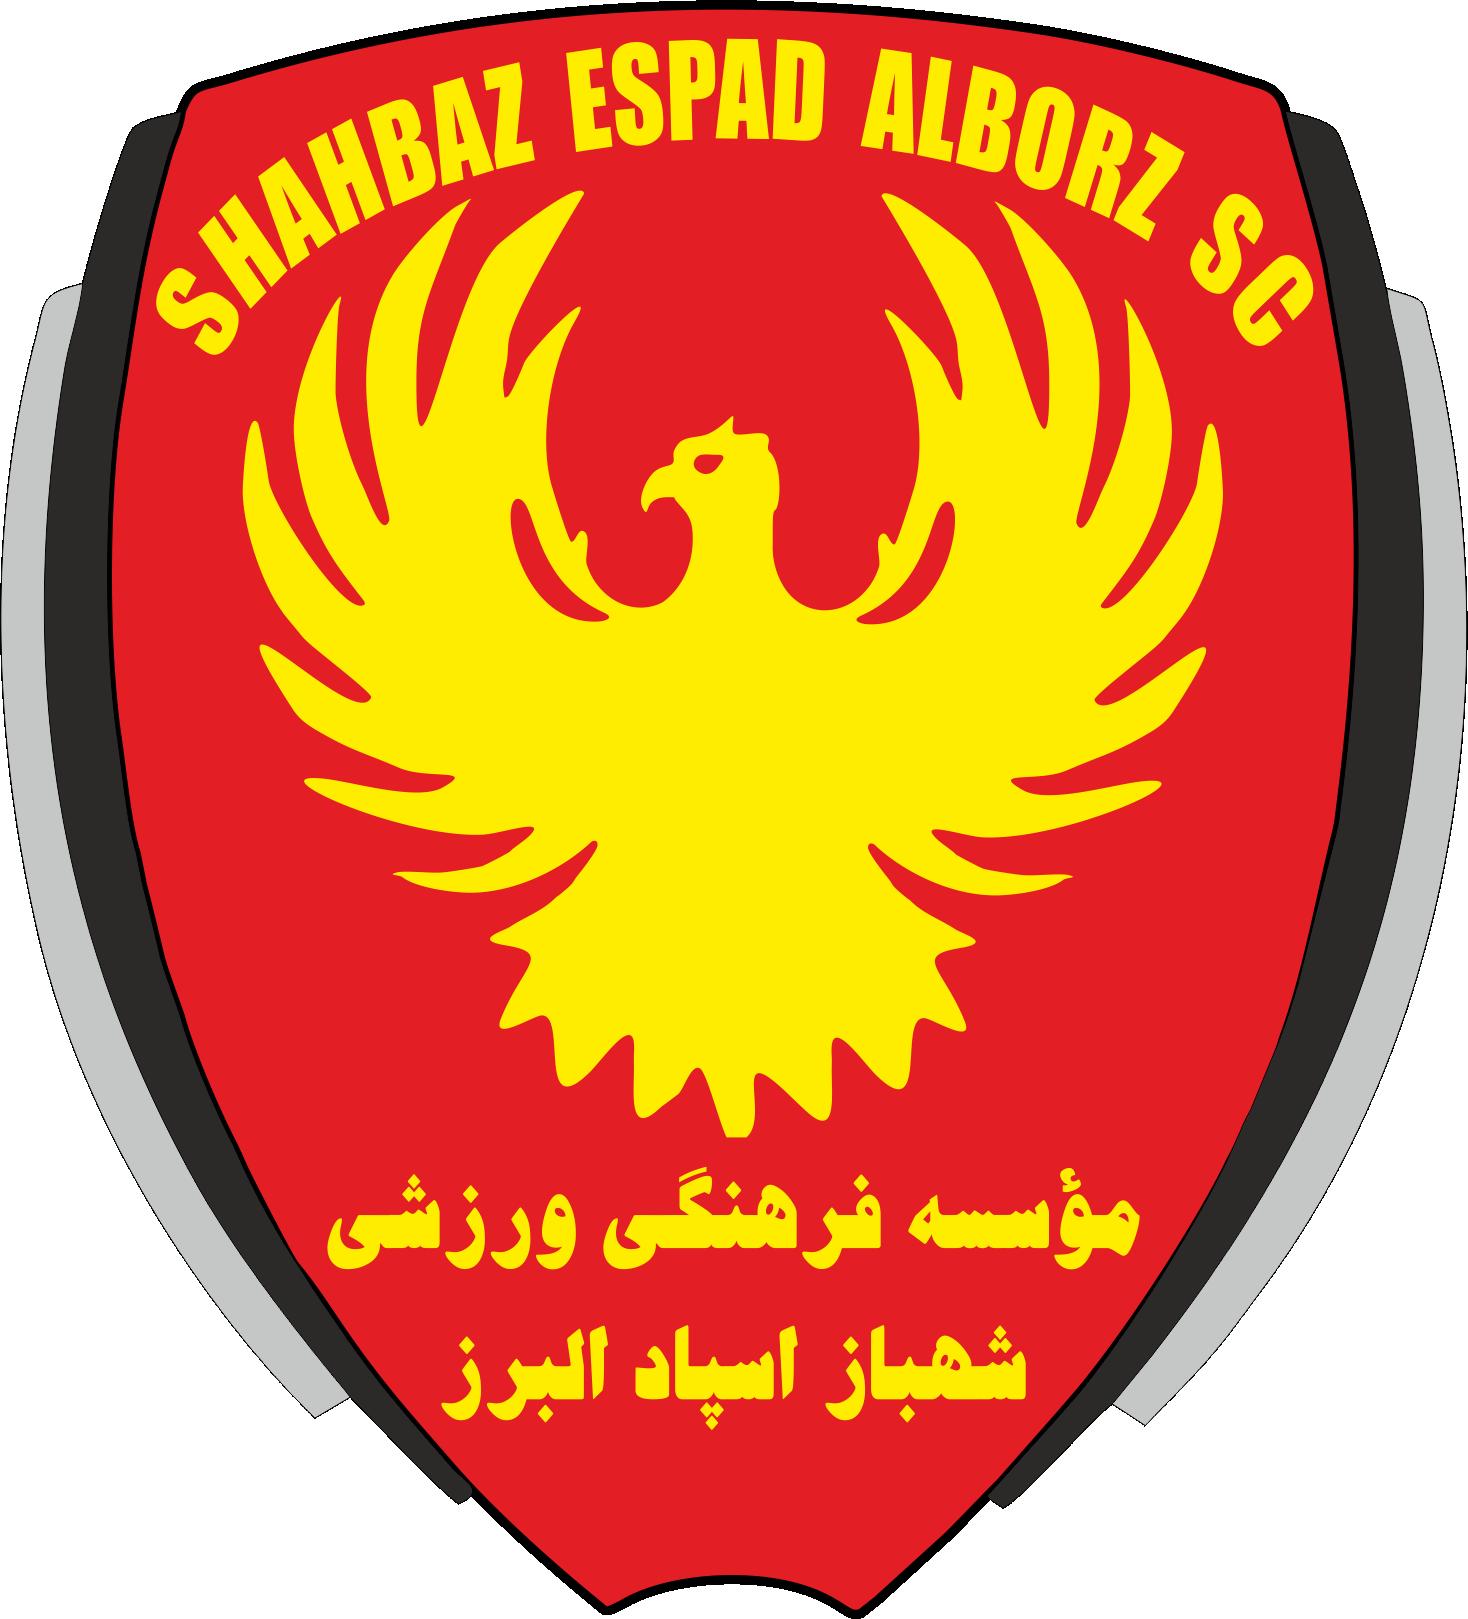 Shahbaz Espad Alborz SC